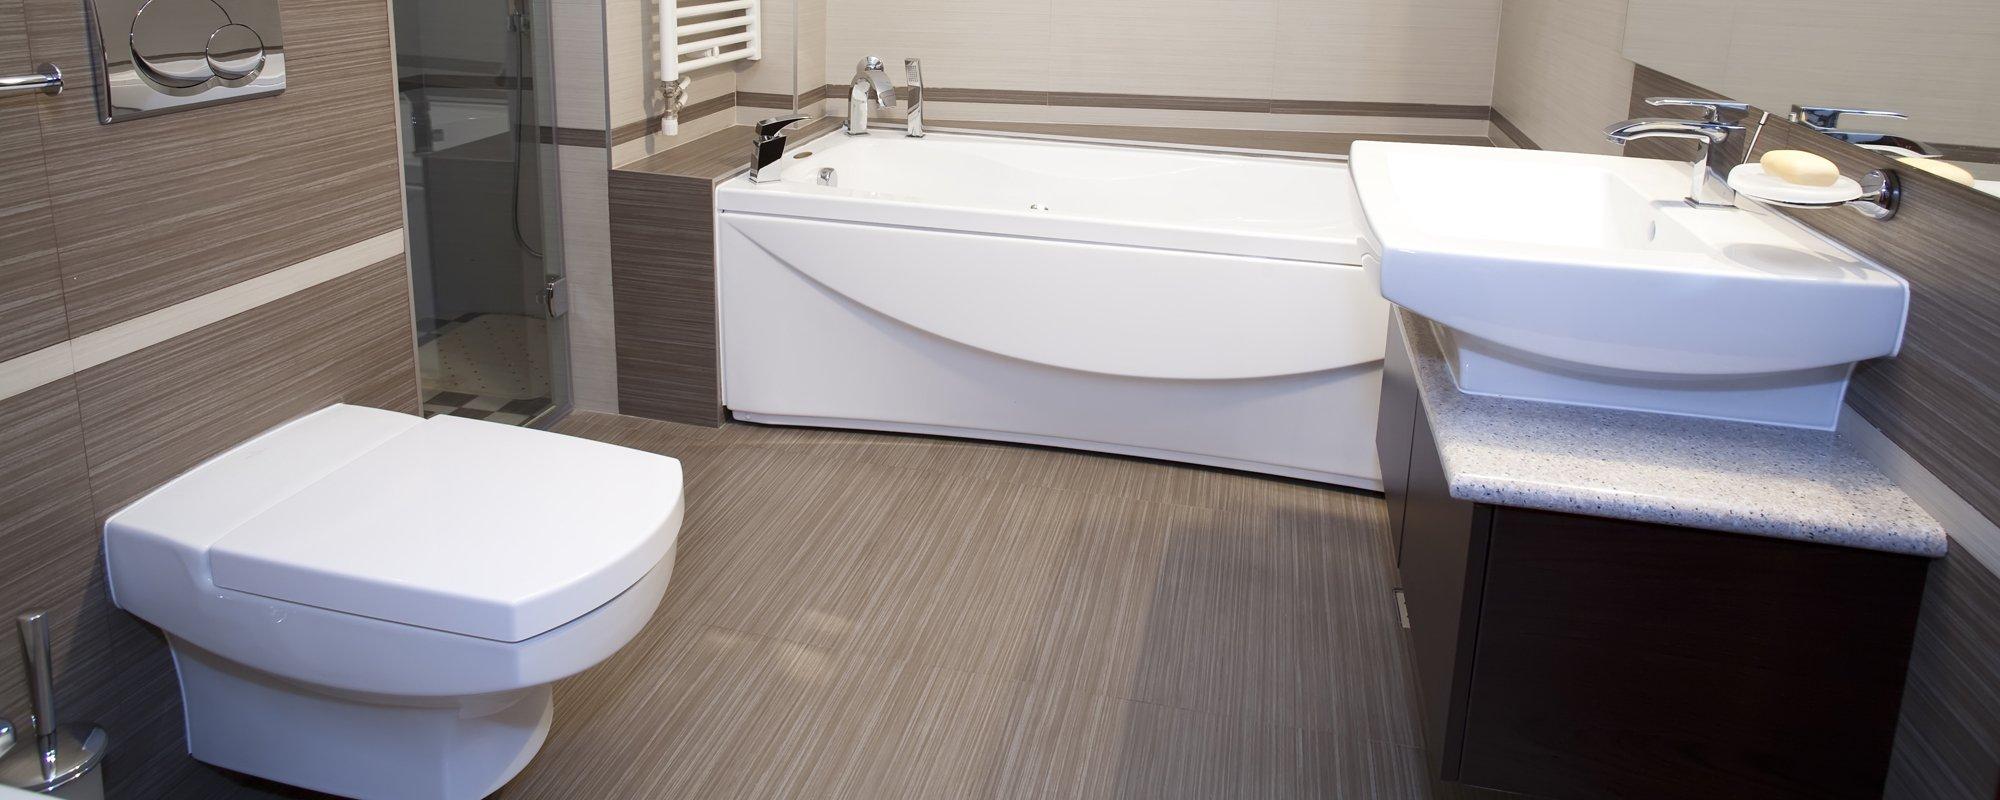 sofa manufacturers glasgow 3 2 seater suites vox installations contractors